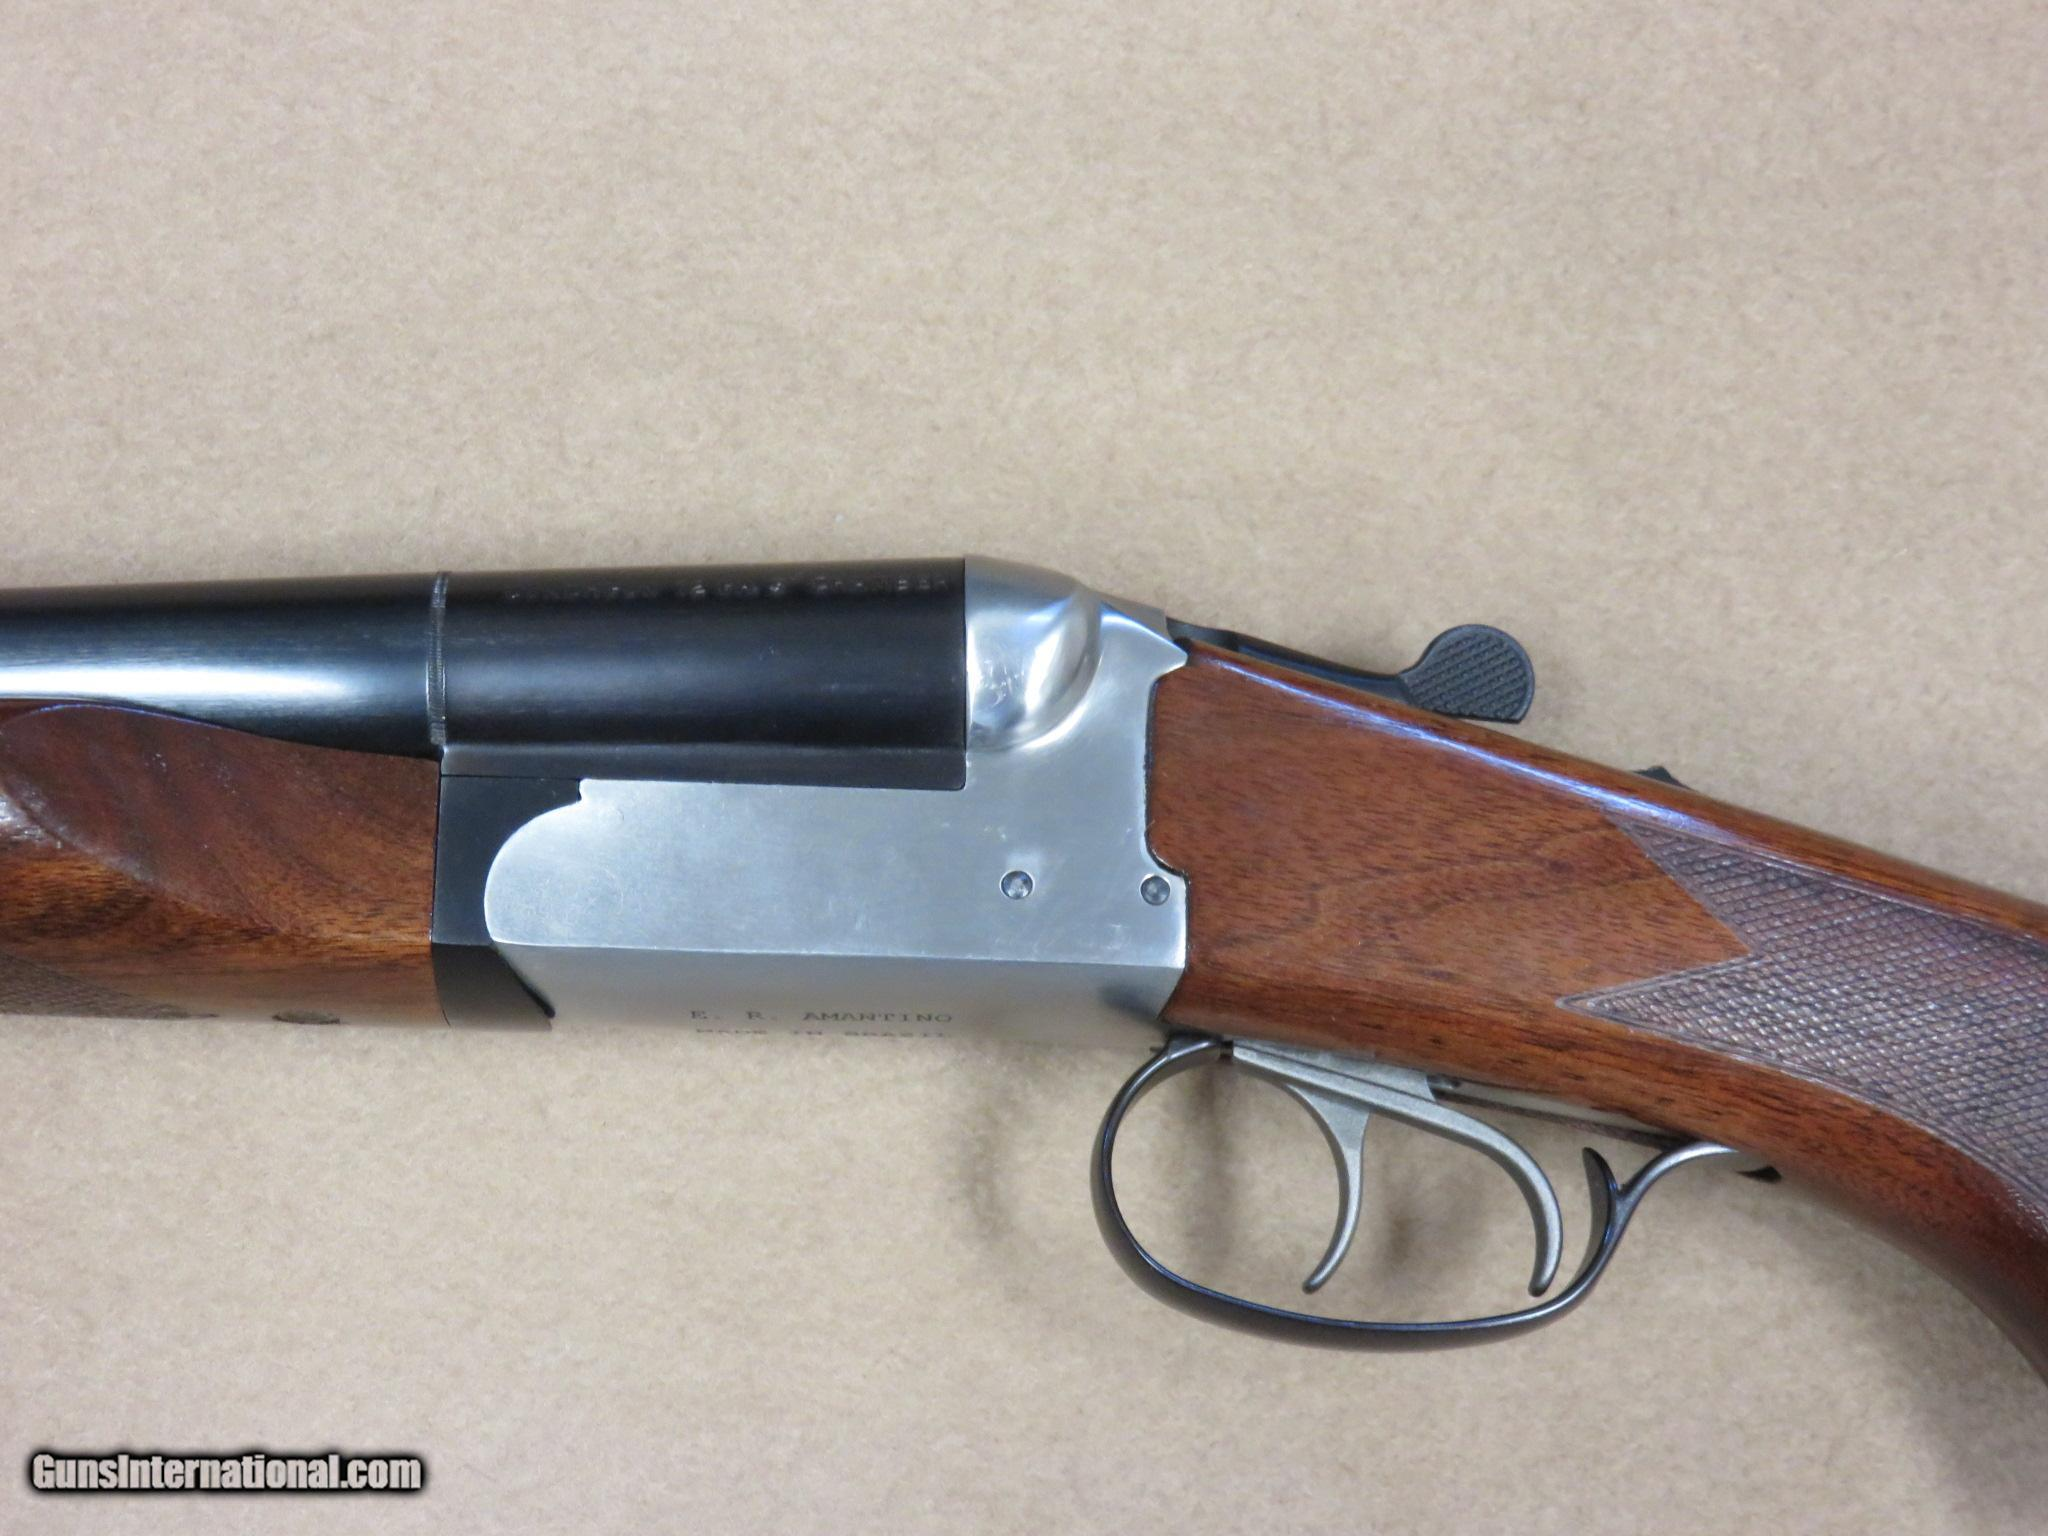 Stoeger Coach Gun 12 Gauge w/ Box/Manual SOLD